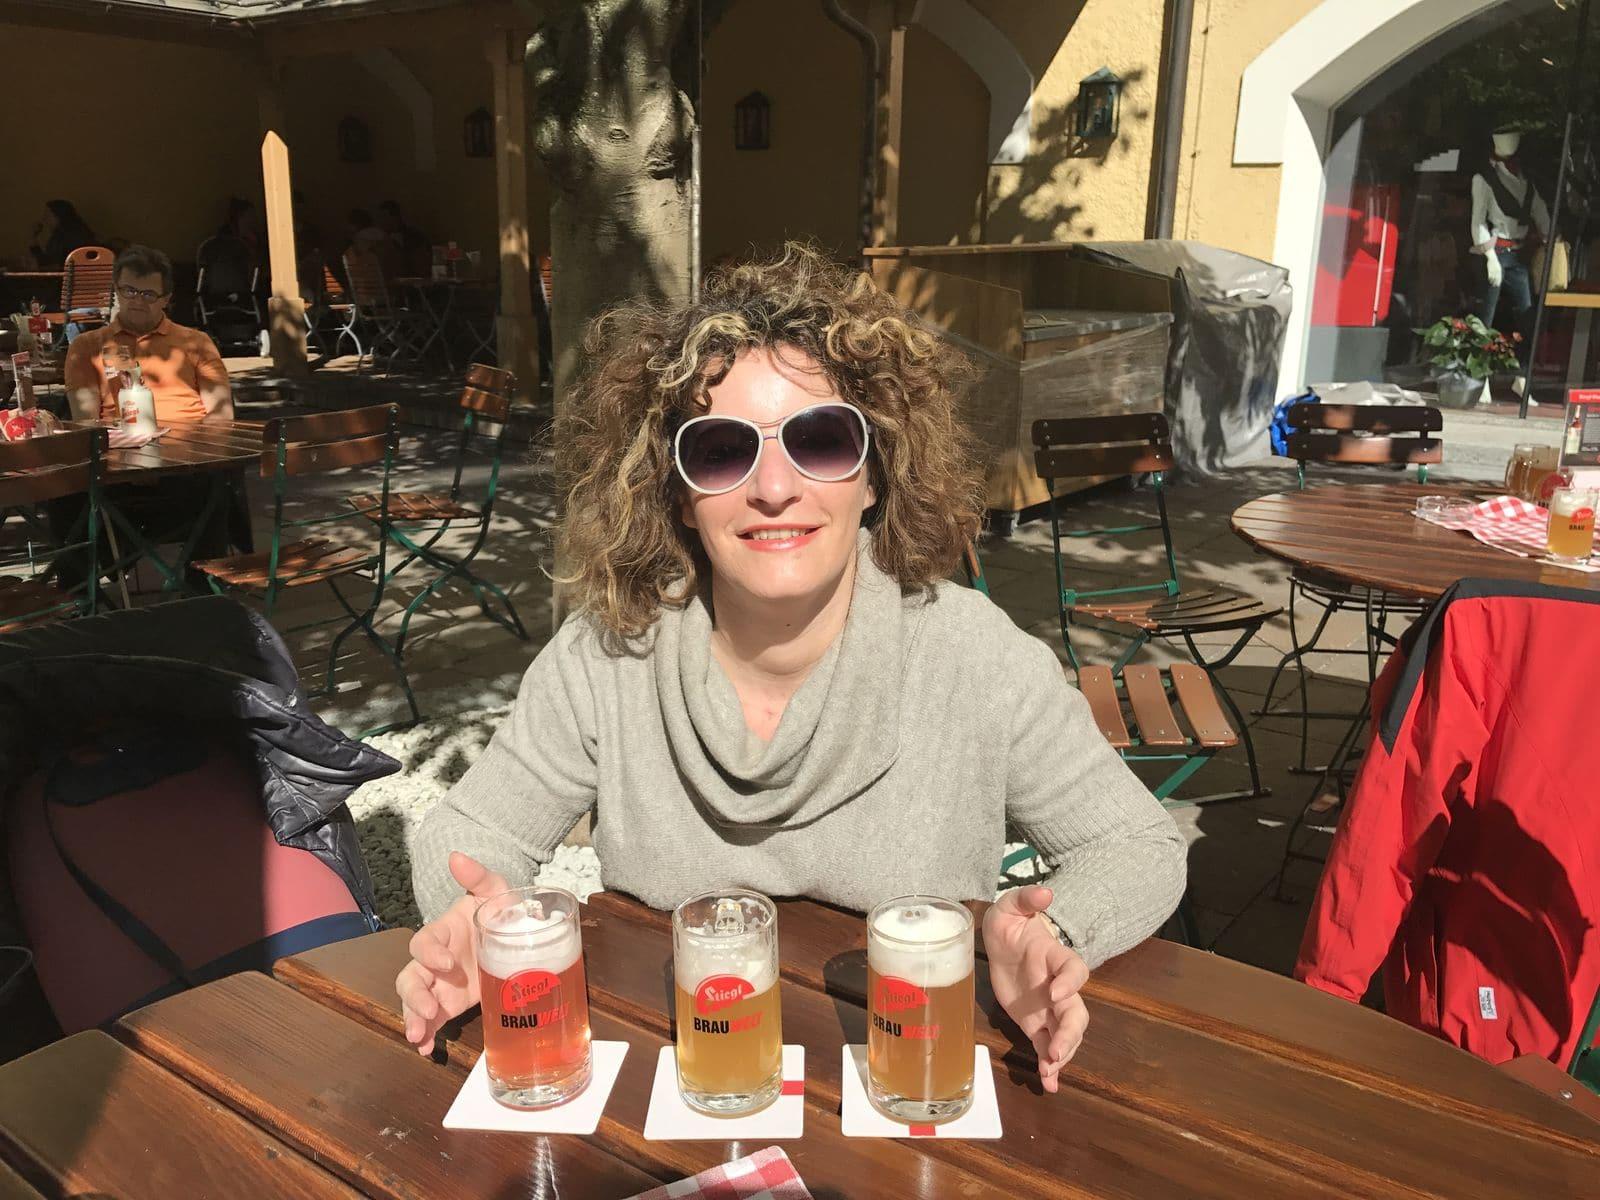 degustazione di birra Stiegl